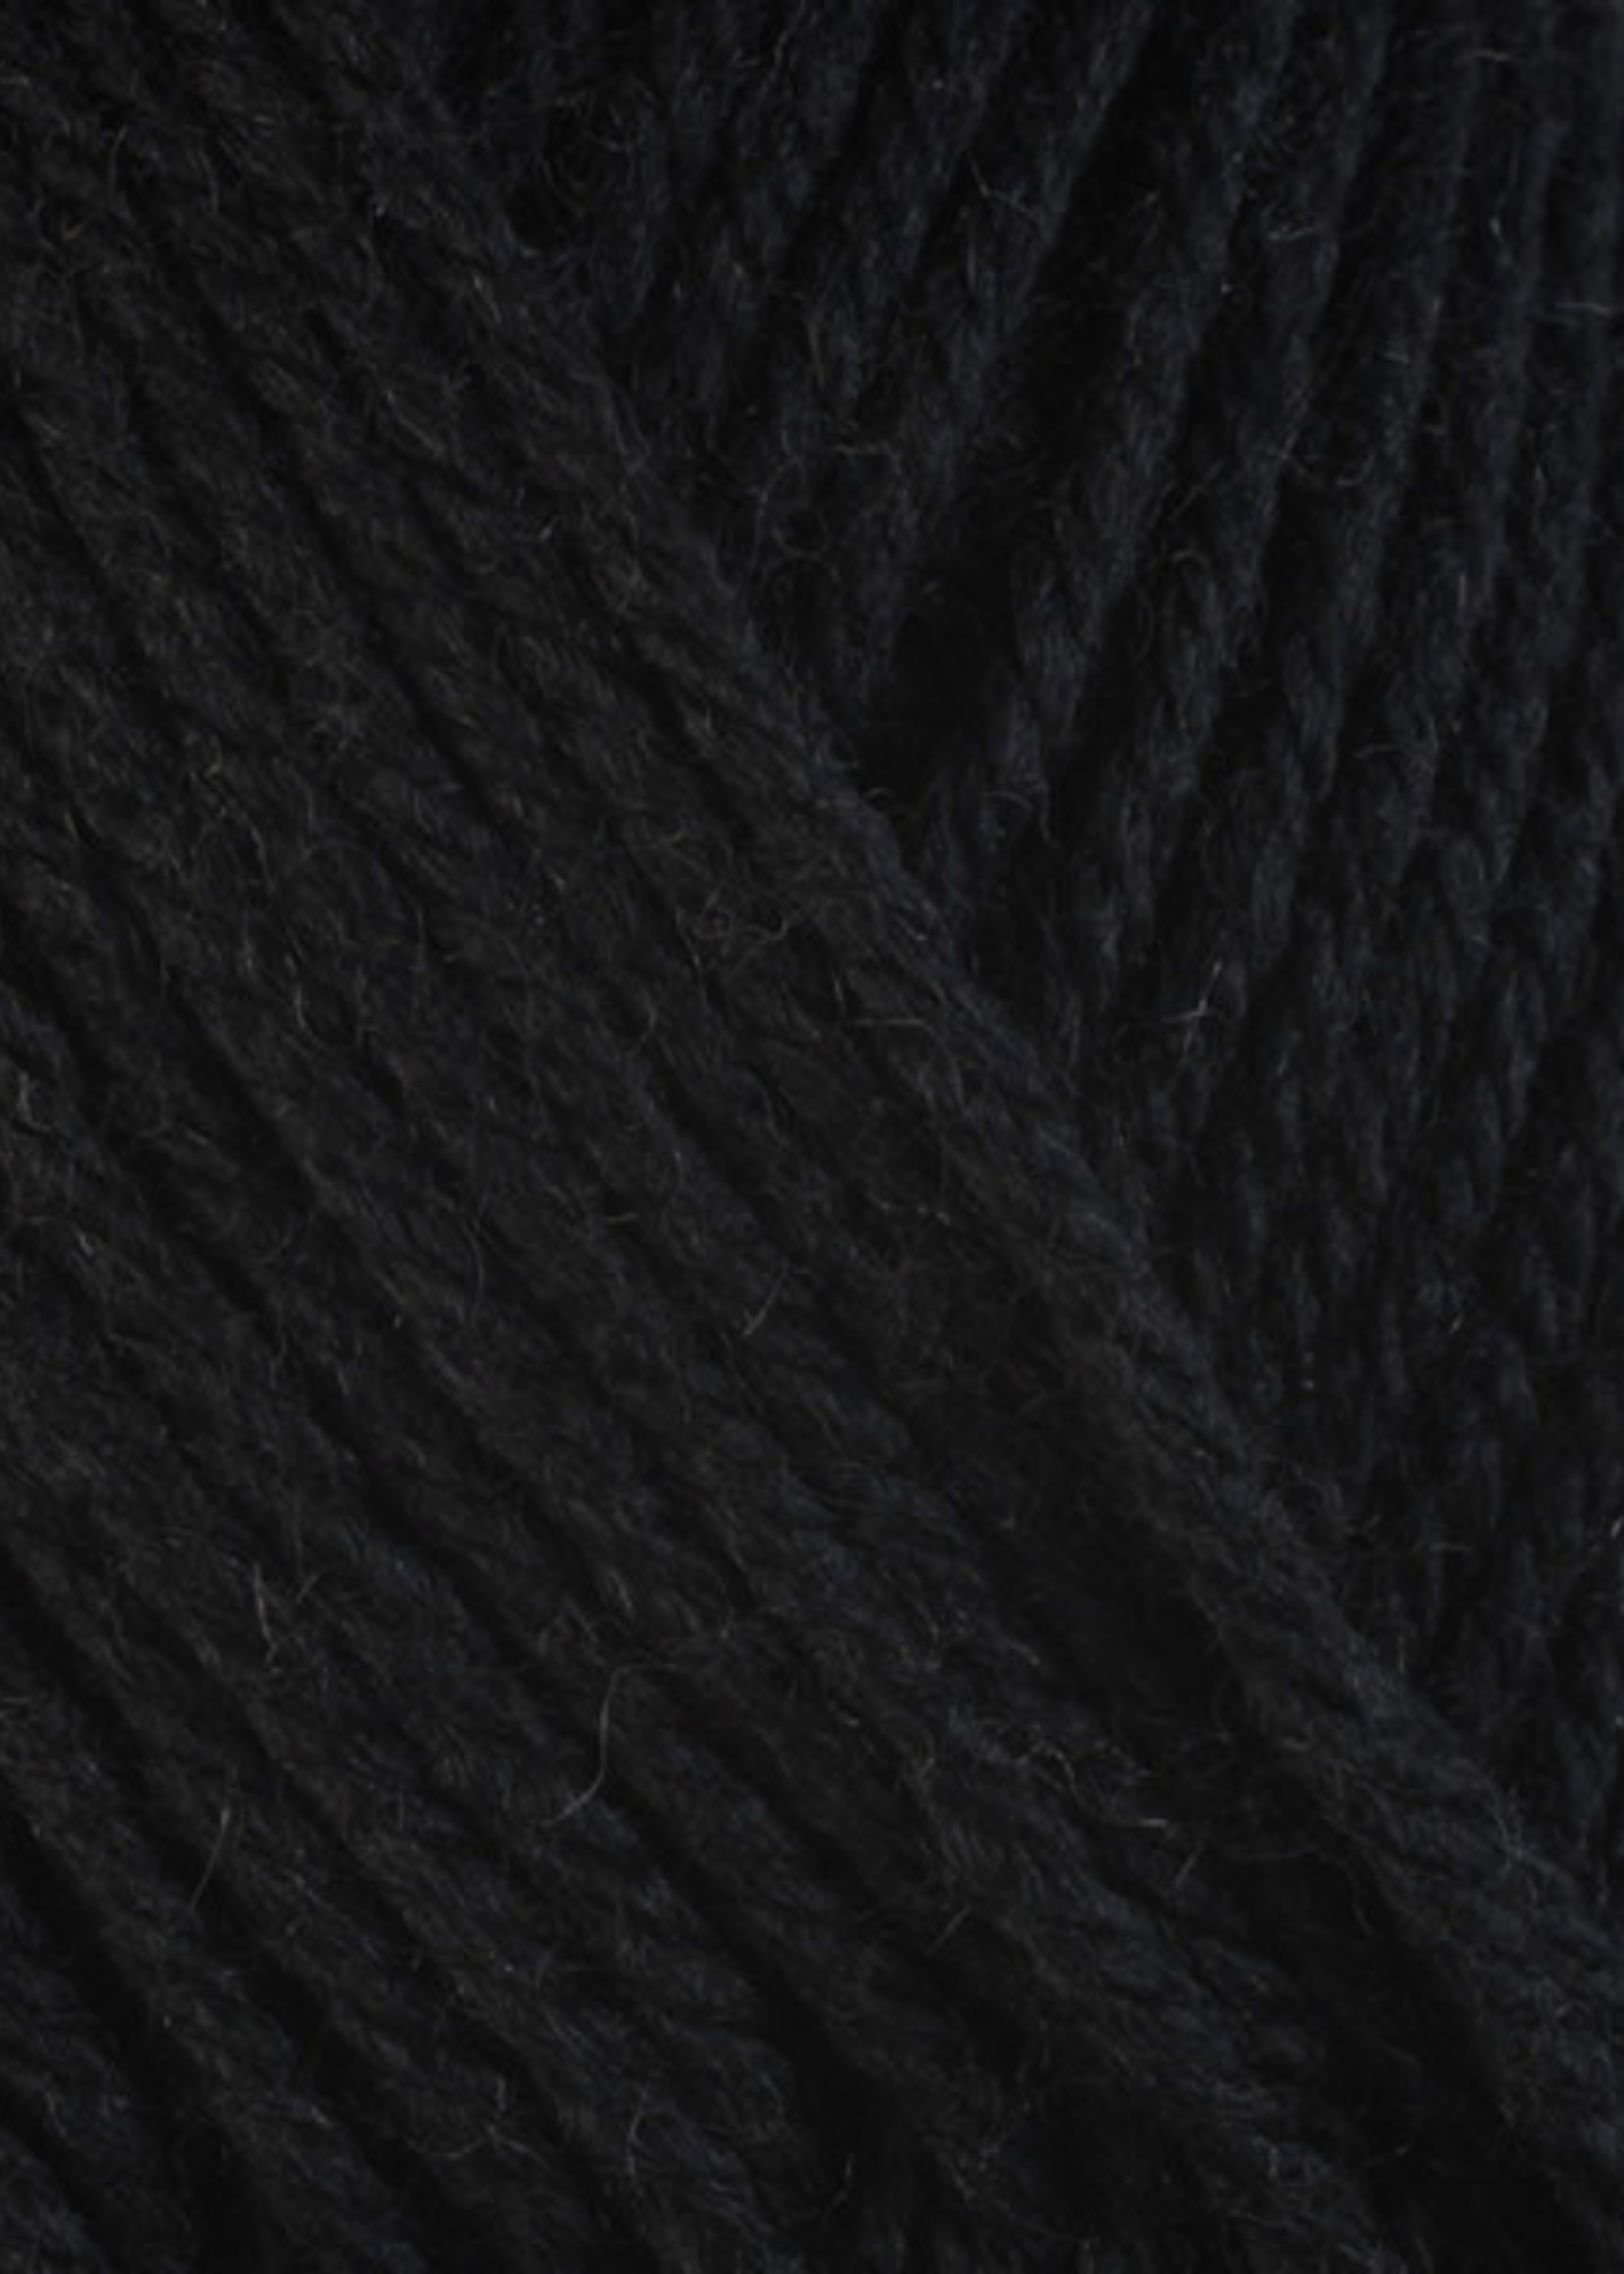 Berroco Berroco Ultra Wool 3334 Cast Iron